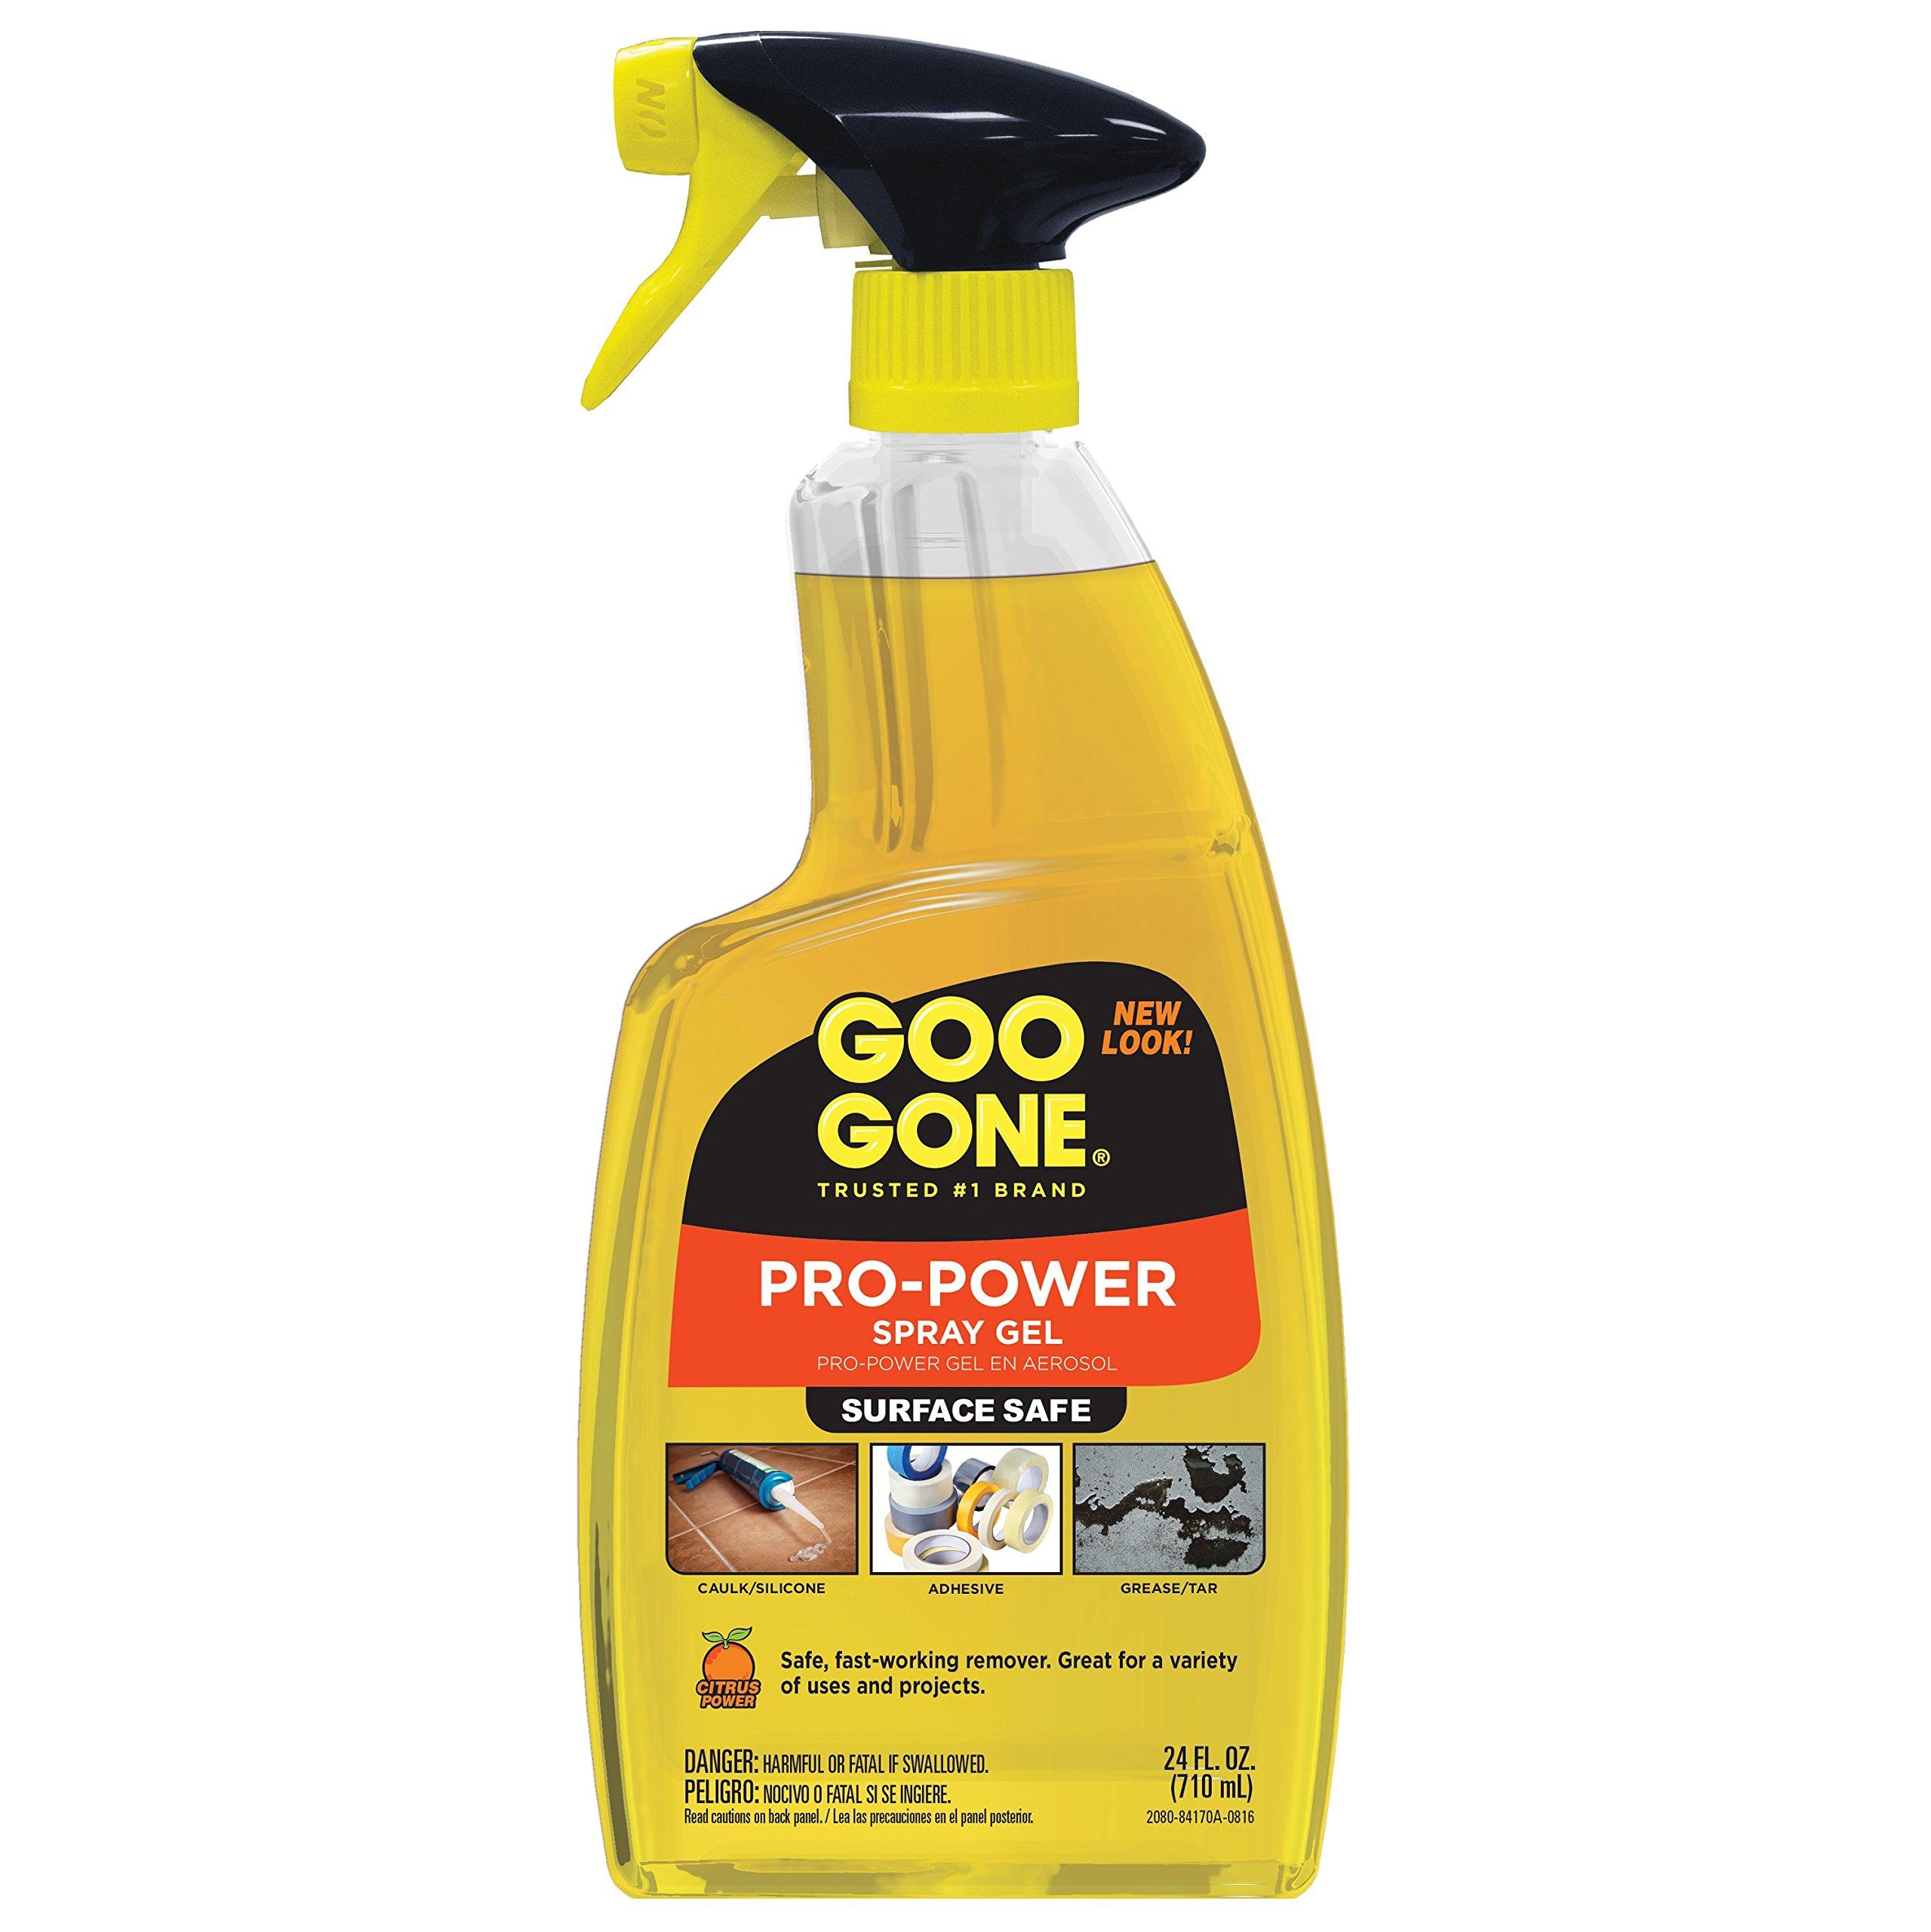 Goo Gone 2080 Pro-Power Spray Gel, Citrus Scent, 24 fl. oz., 11.25'' Height, 8.6'' width (Pack of 6)